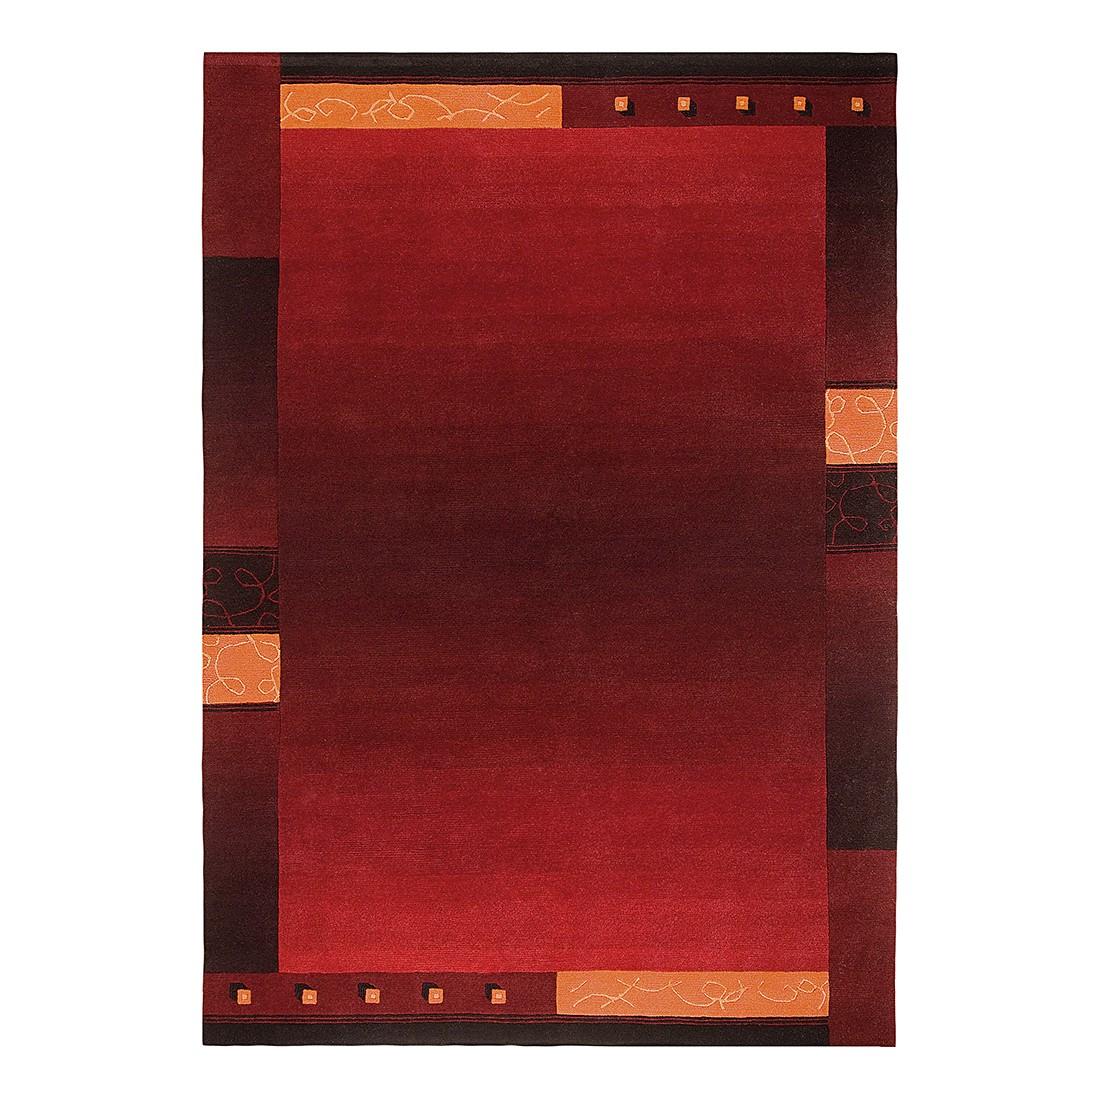 Teppich Super Q - Wolle/ Rot - 170 cm x 240 cm, Luxor living